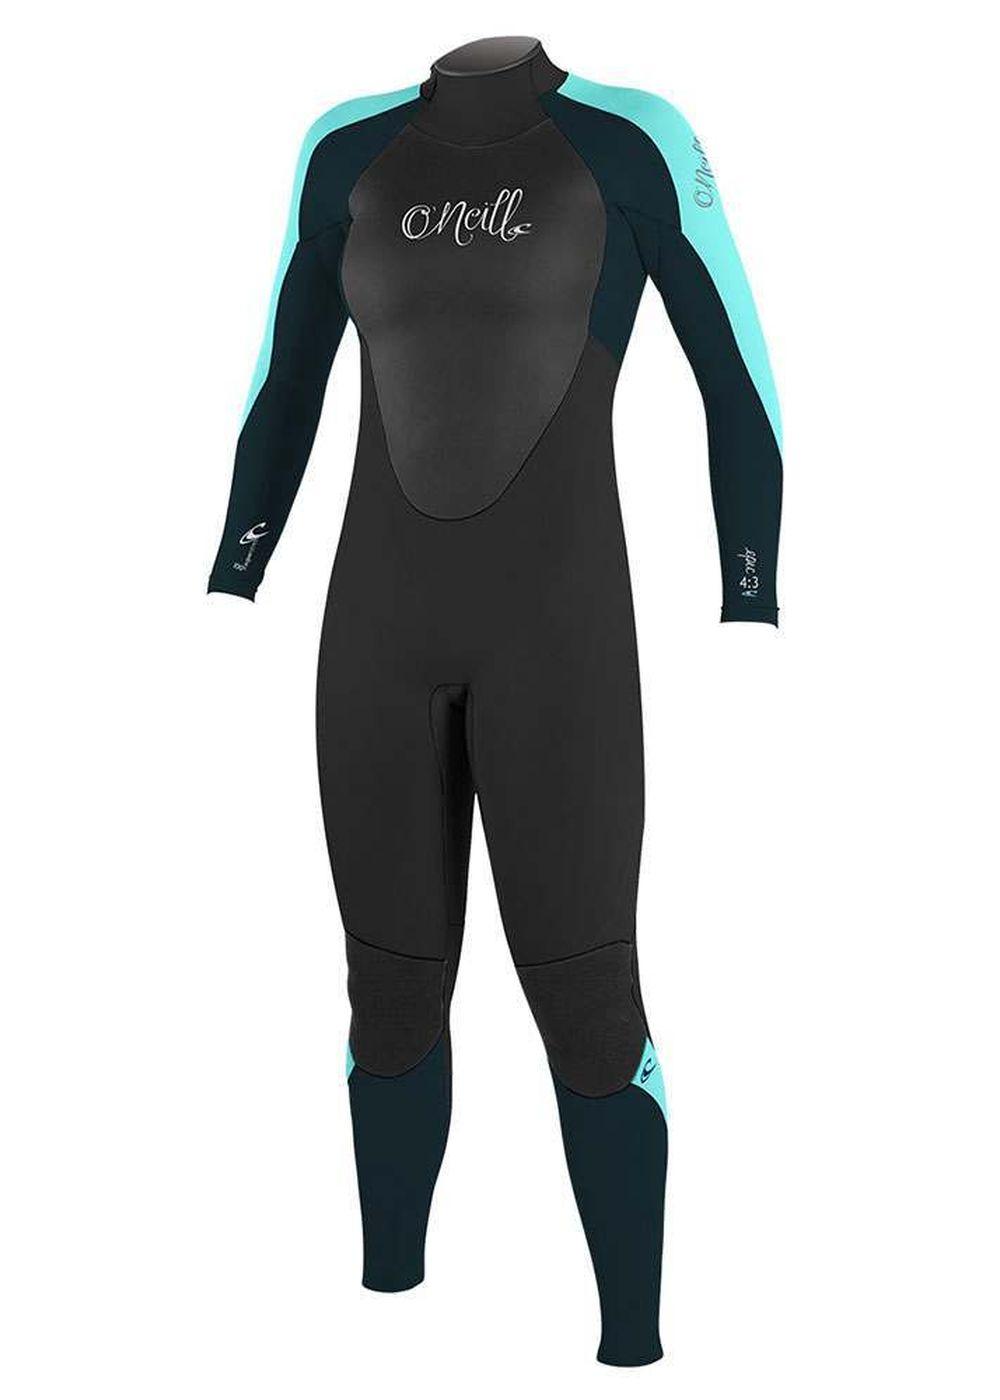 Oneill Womens Epic Bz 4/3 Wetsuit 2018 Blk/slt/sea Picture